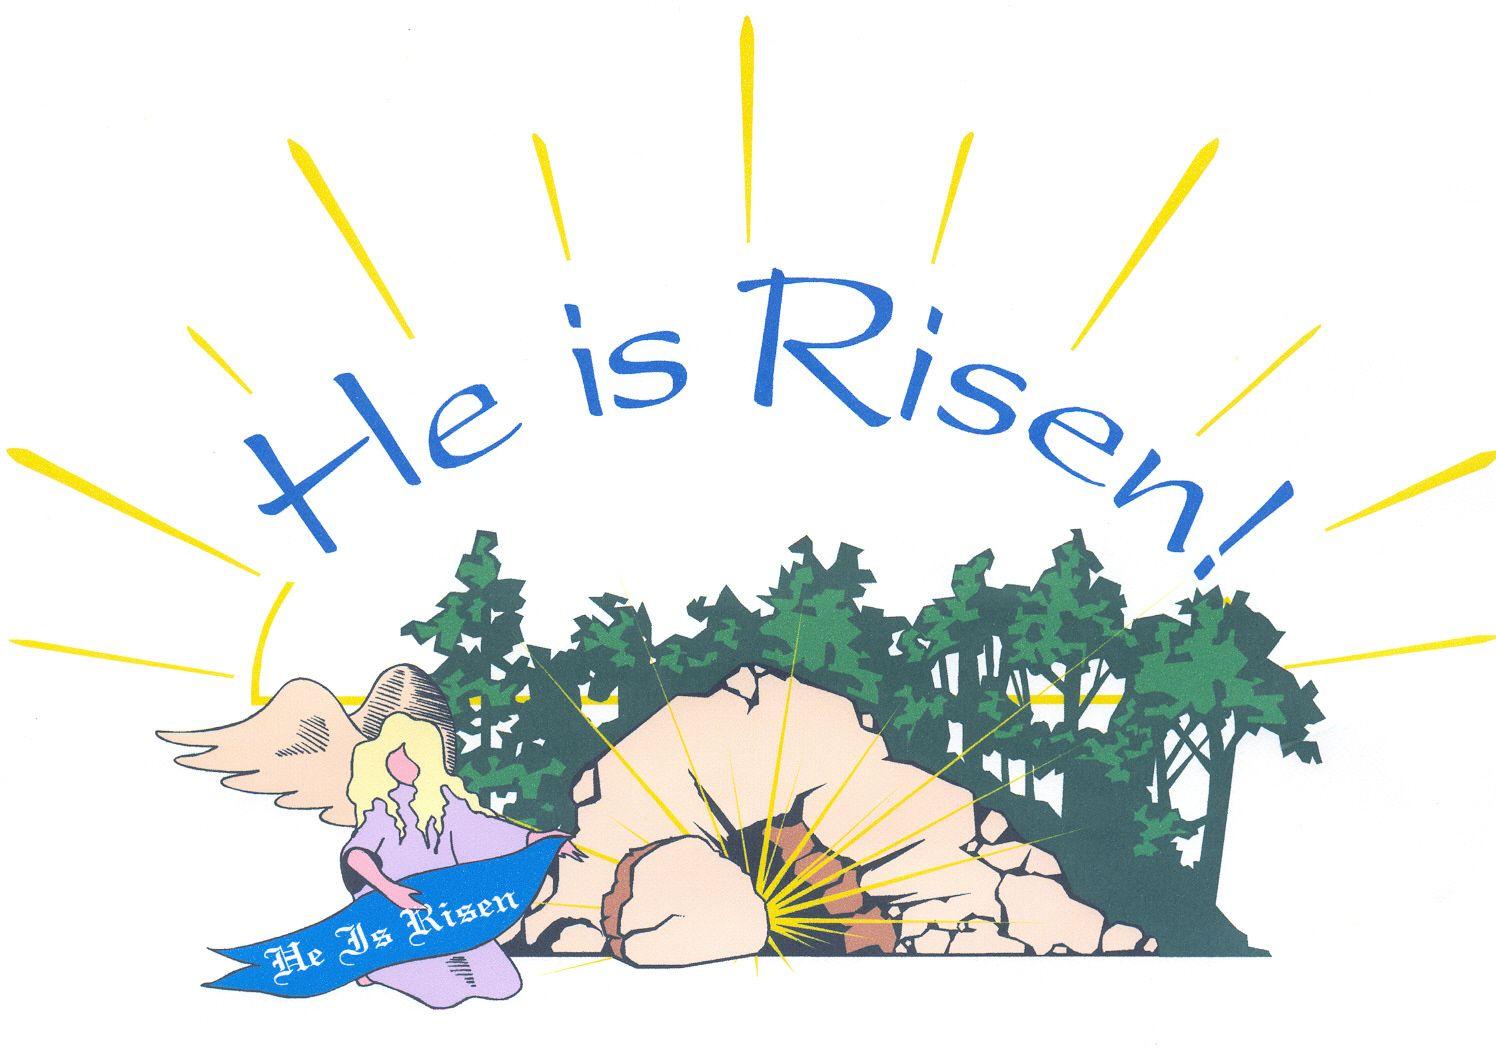 Free christian easter clipart royalty free library Jesus is Risen - Easter Wallpaper | Art | Easter wallpaper ... royalty free library